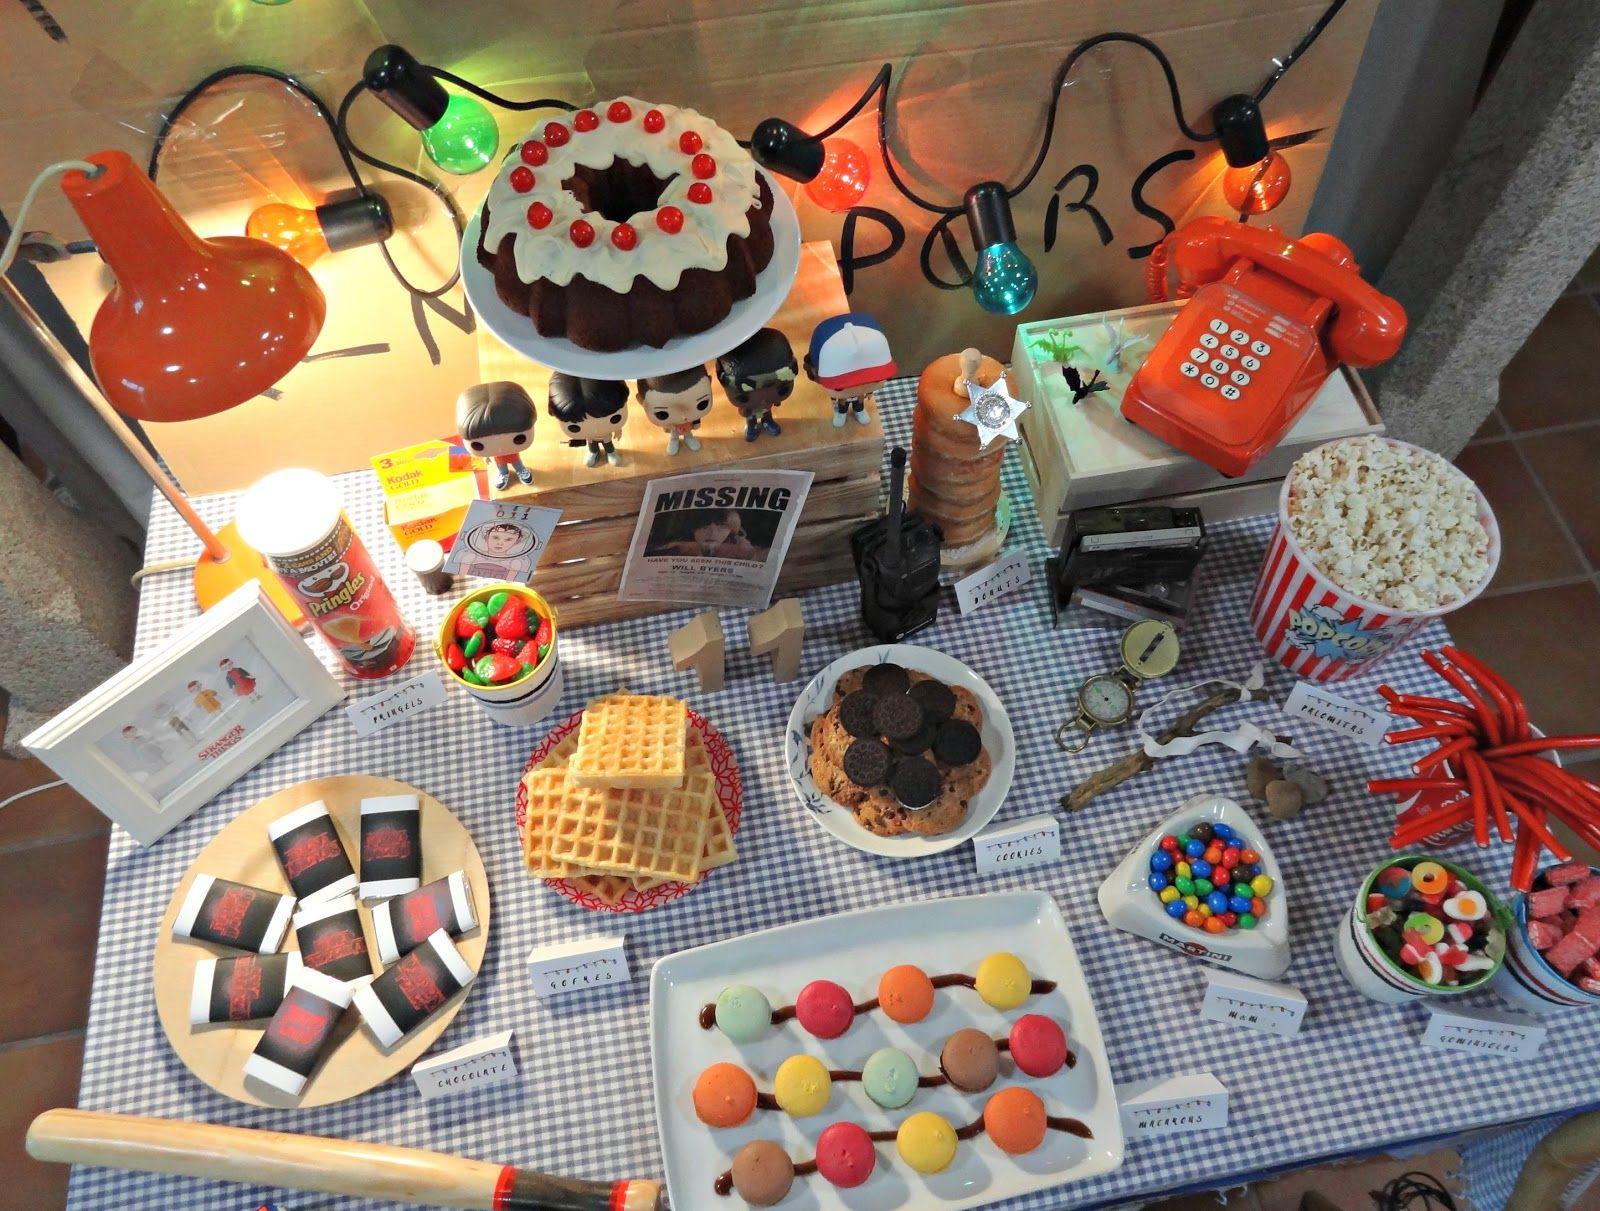 Stranger Things Party Decoracion fiesta cumpleaños